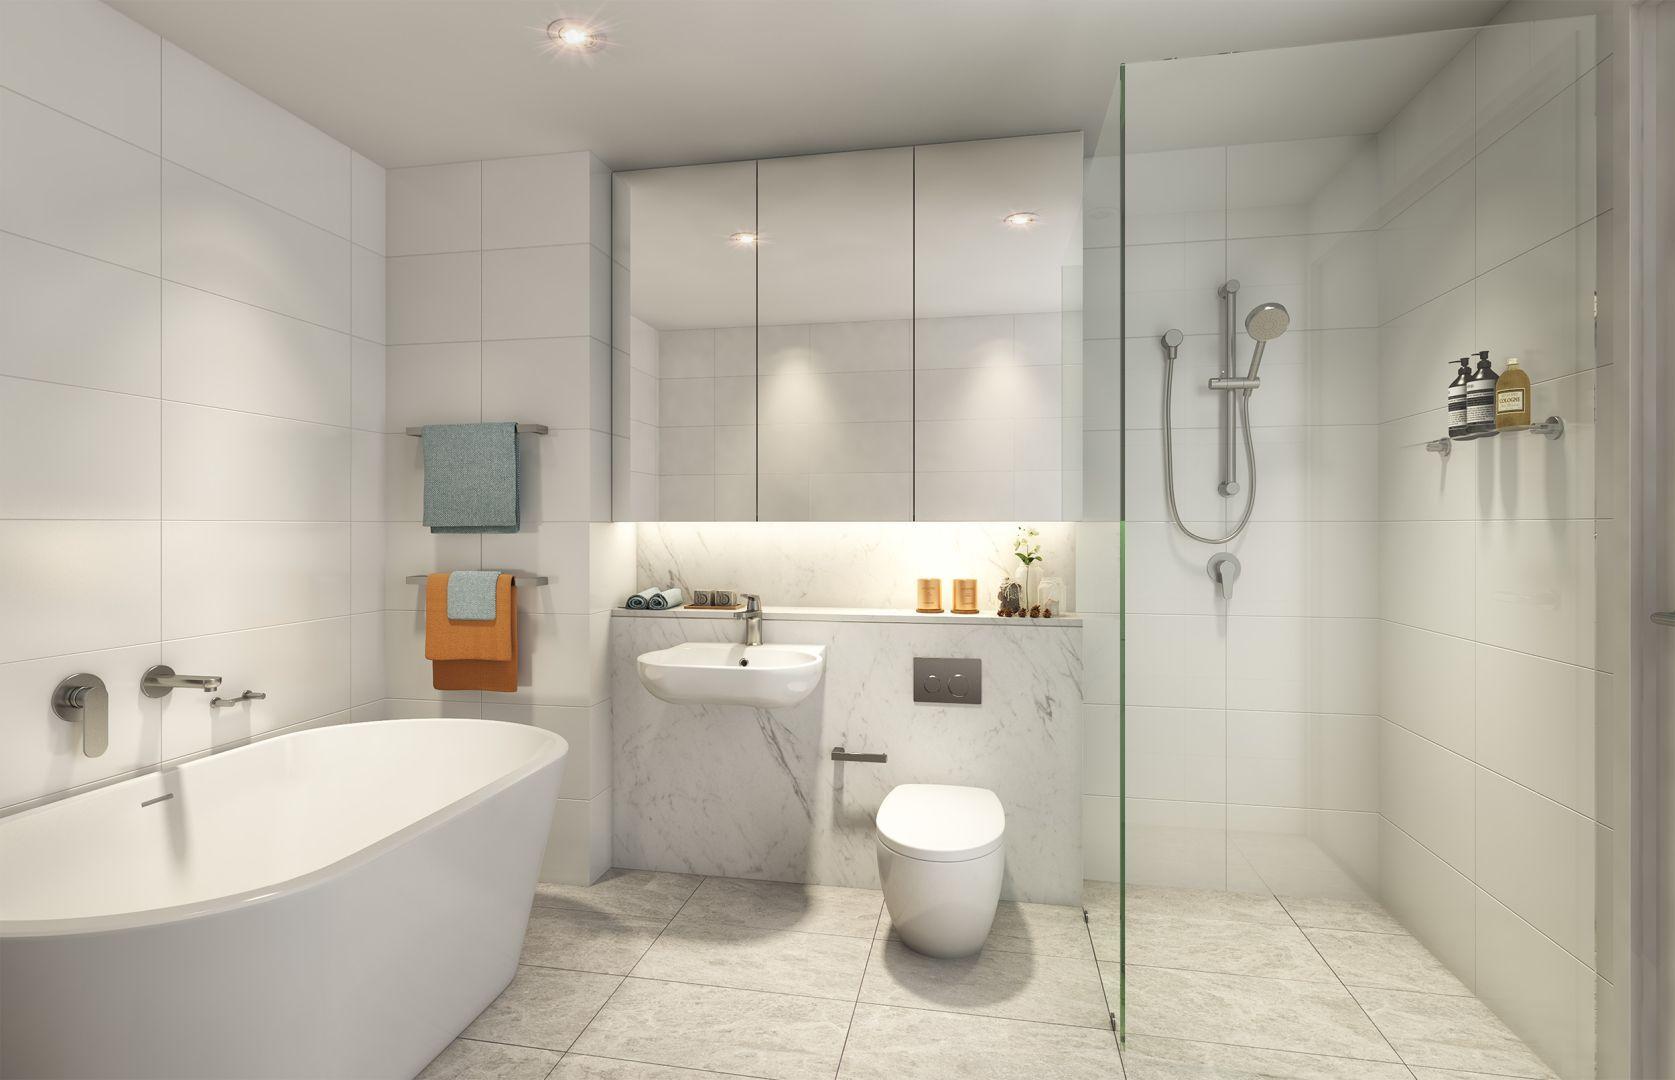 1 Bed/231 Miller Street, North Sydney NSW 2060, Image 2